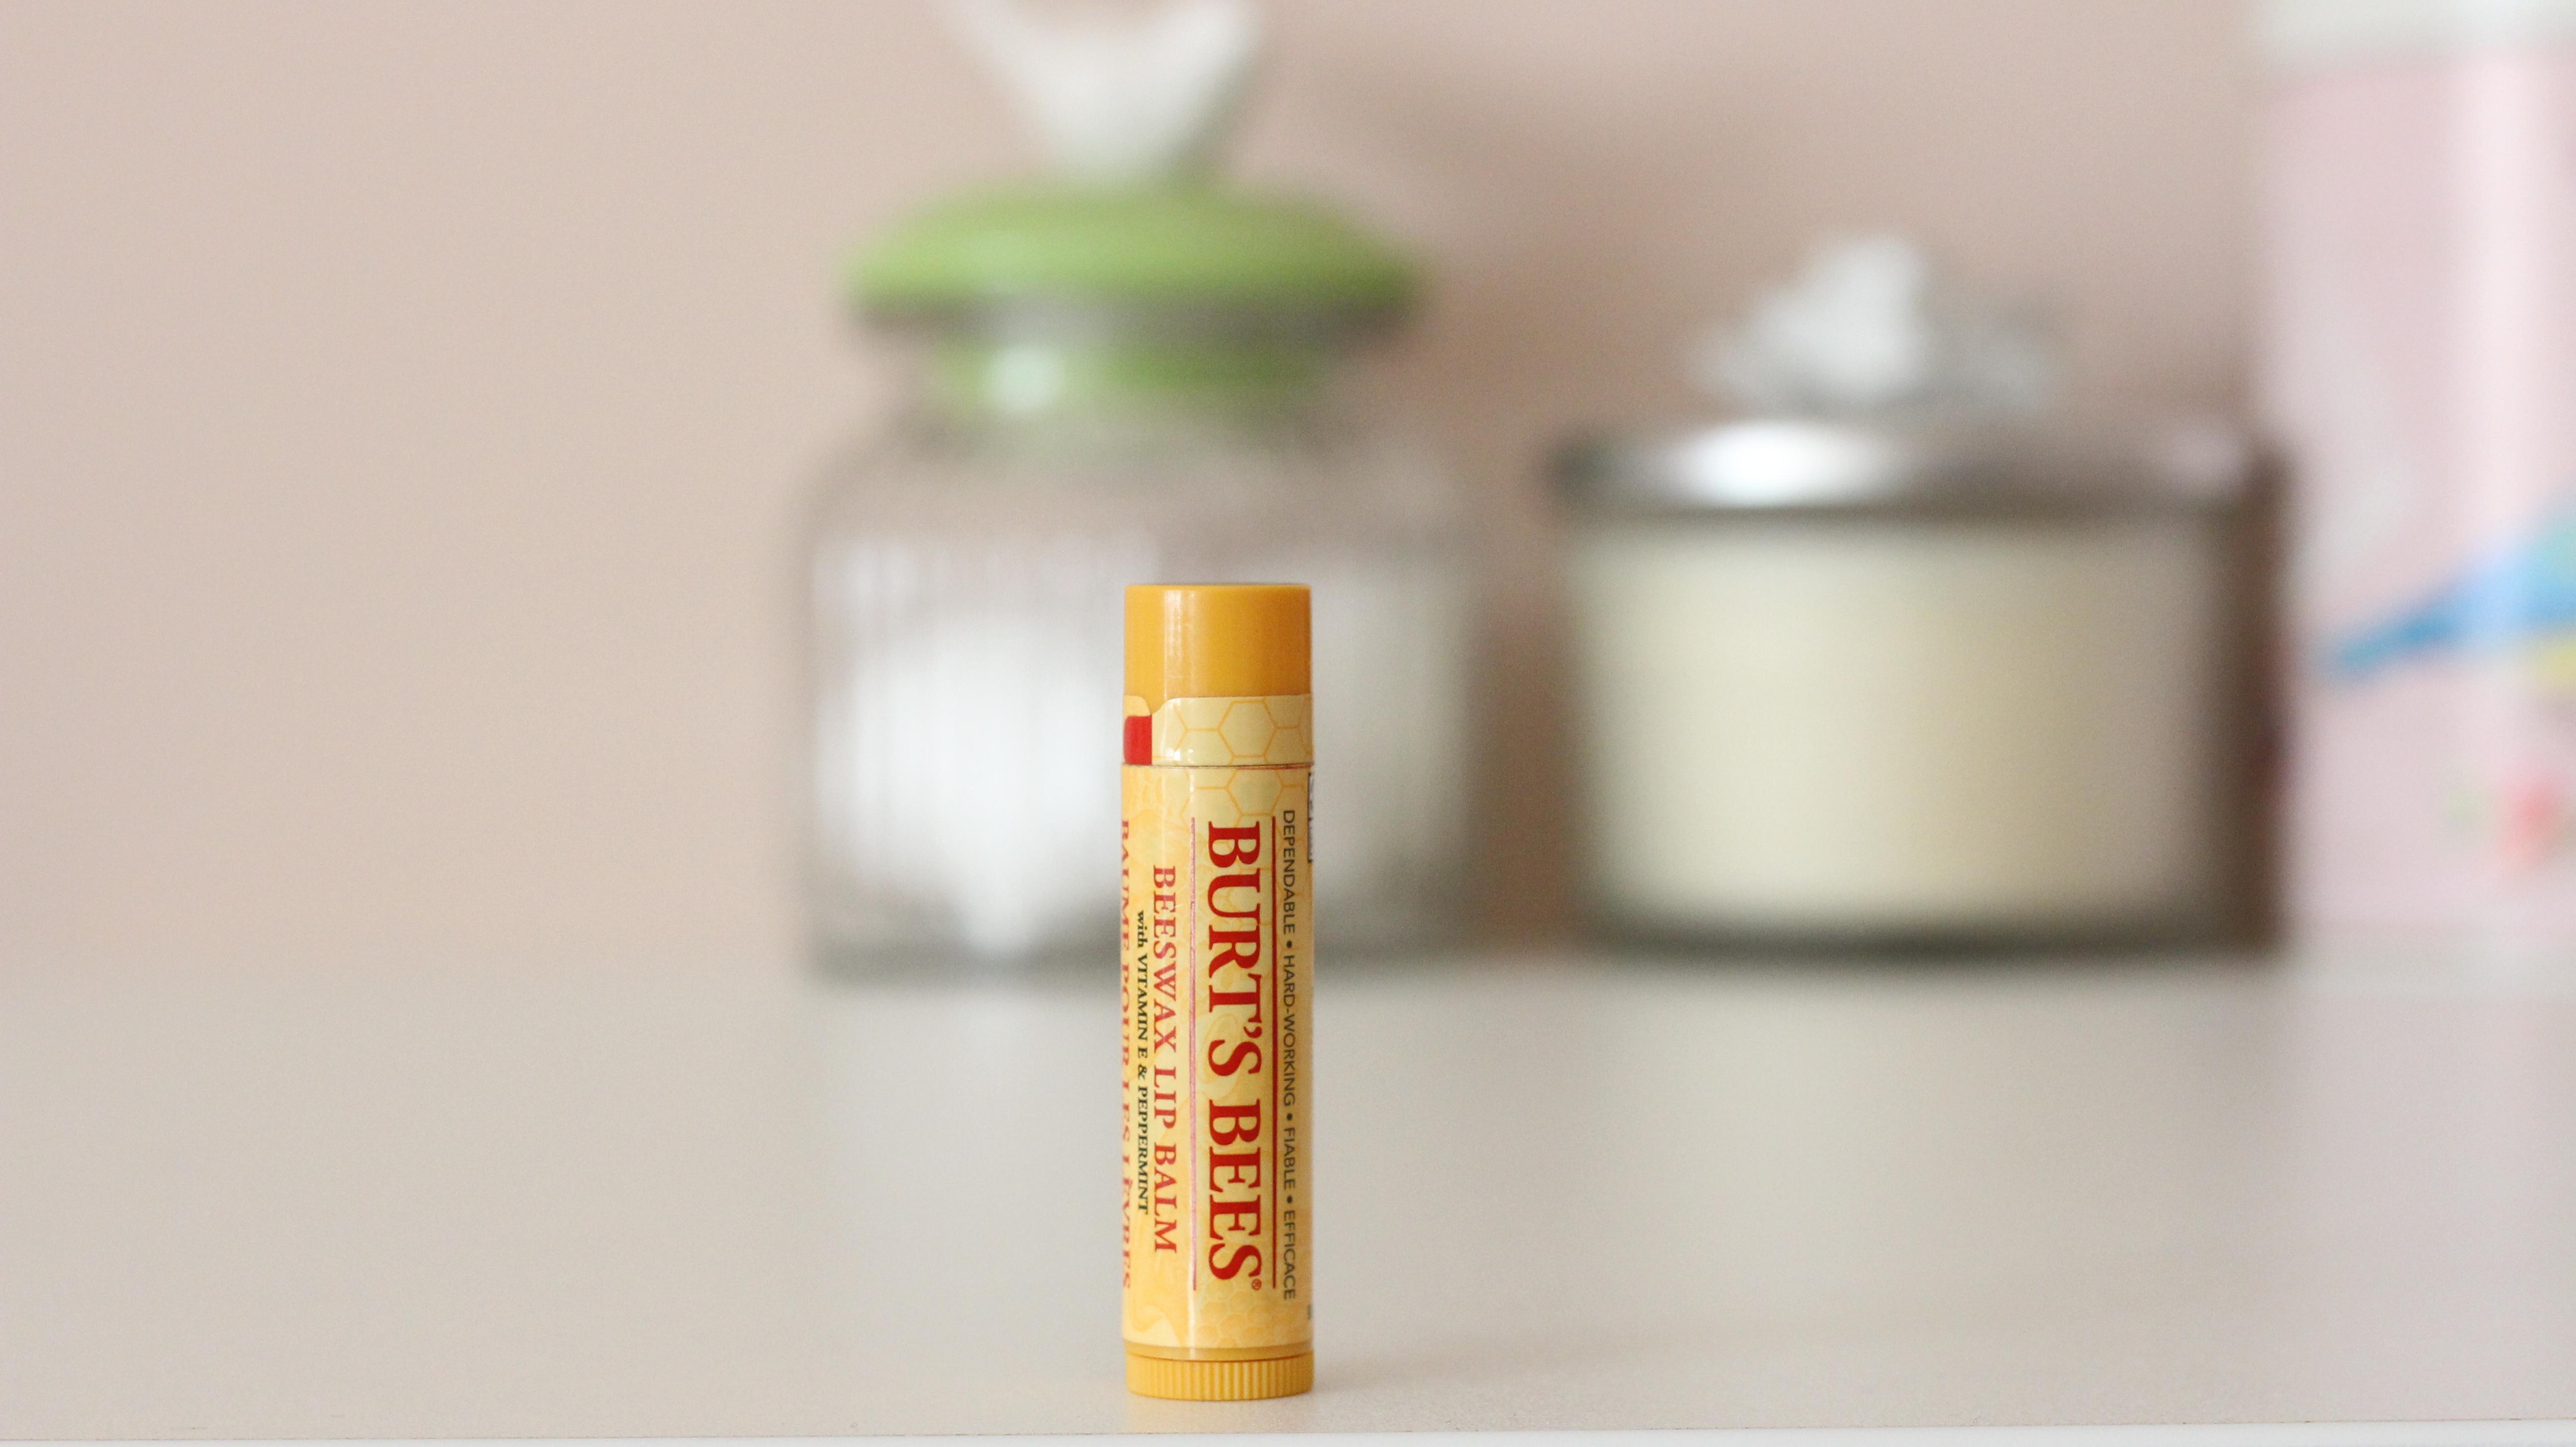 Burt's Bees® Beeswax Lip Balm uploaded by Jamie R.